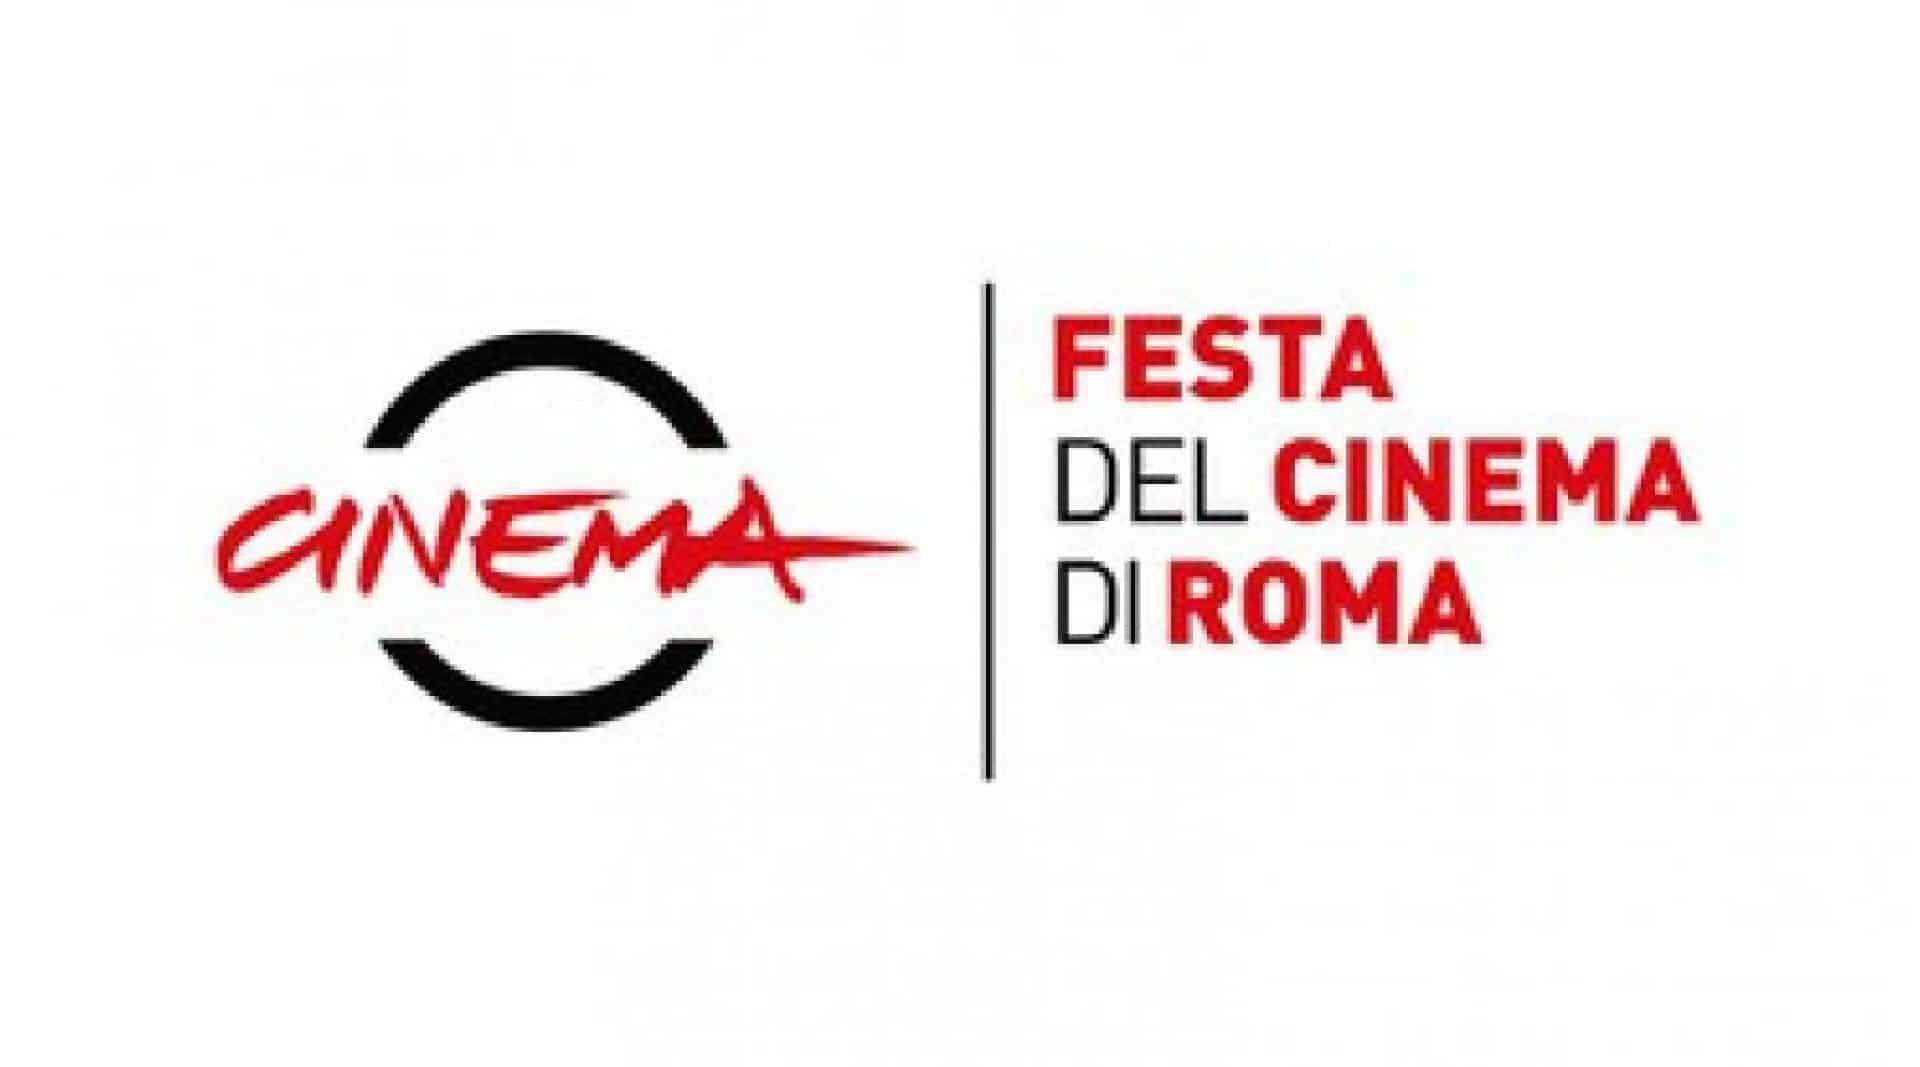 festa-del-cinema-roma-medicinema